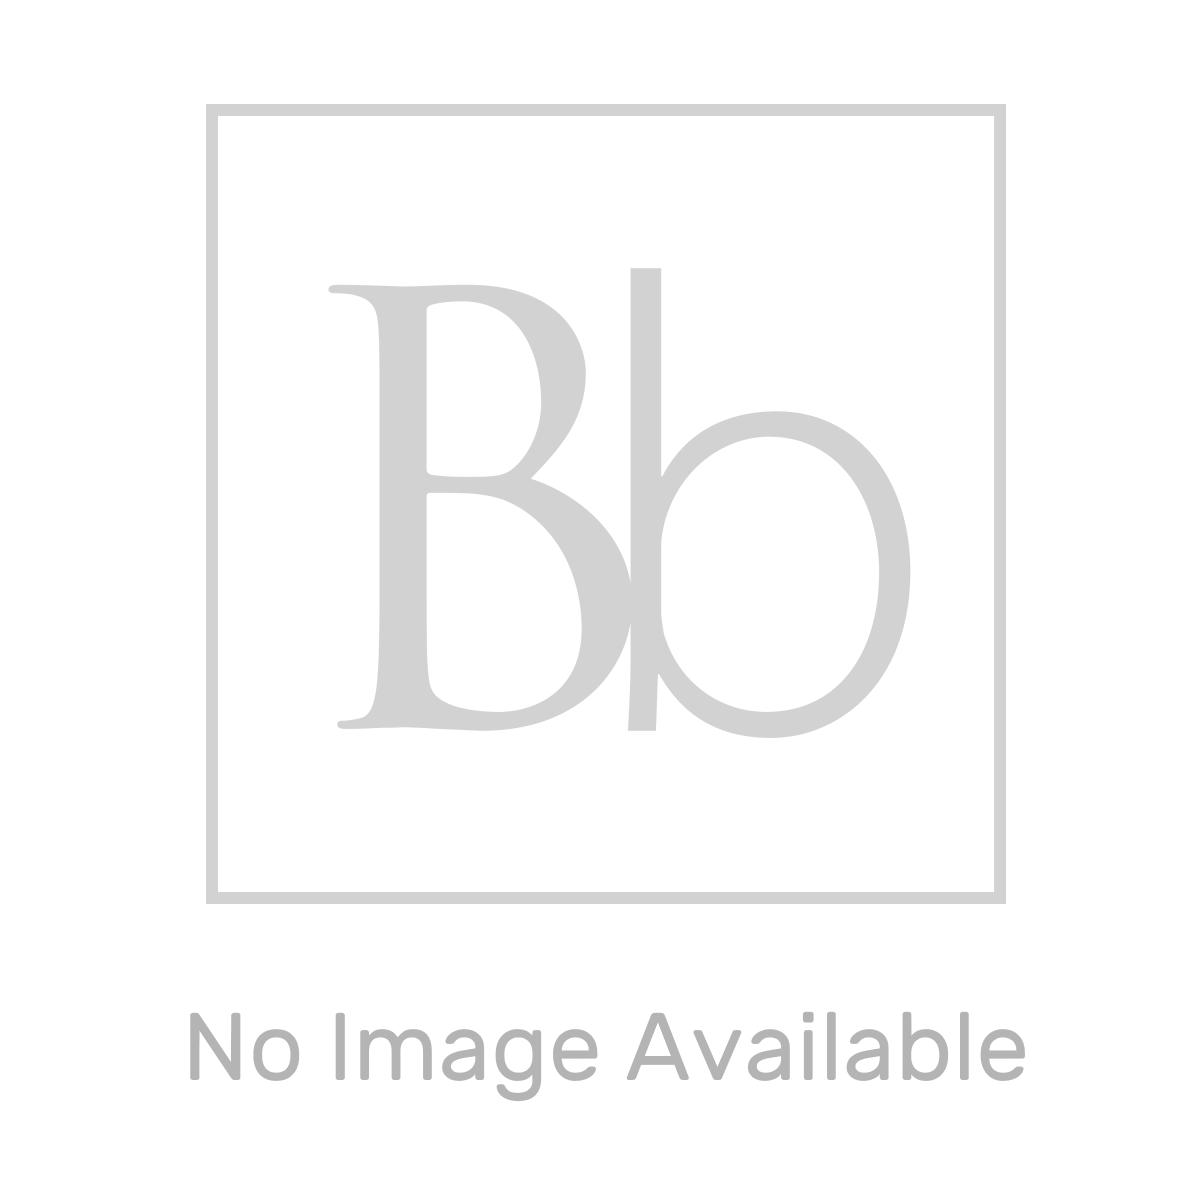 RAK Series 600 Short Projection Toilet with Slimline Soft Close Seat